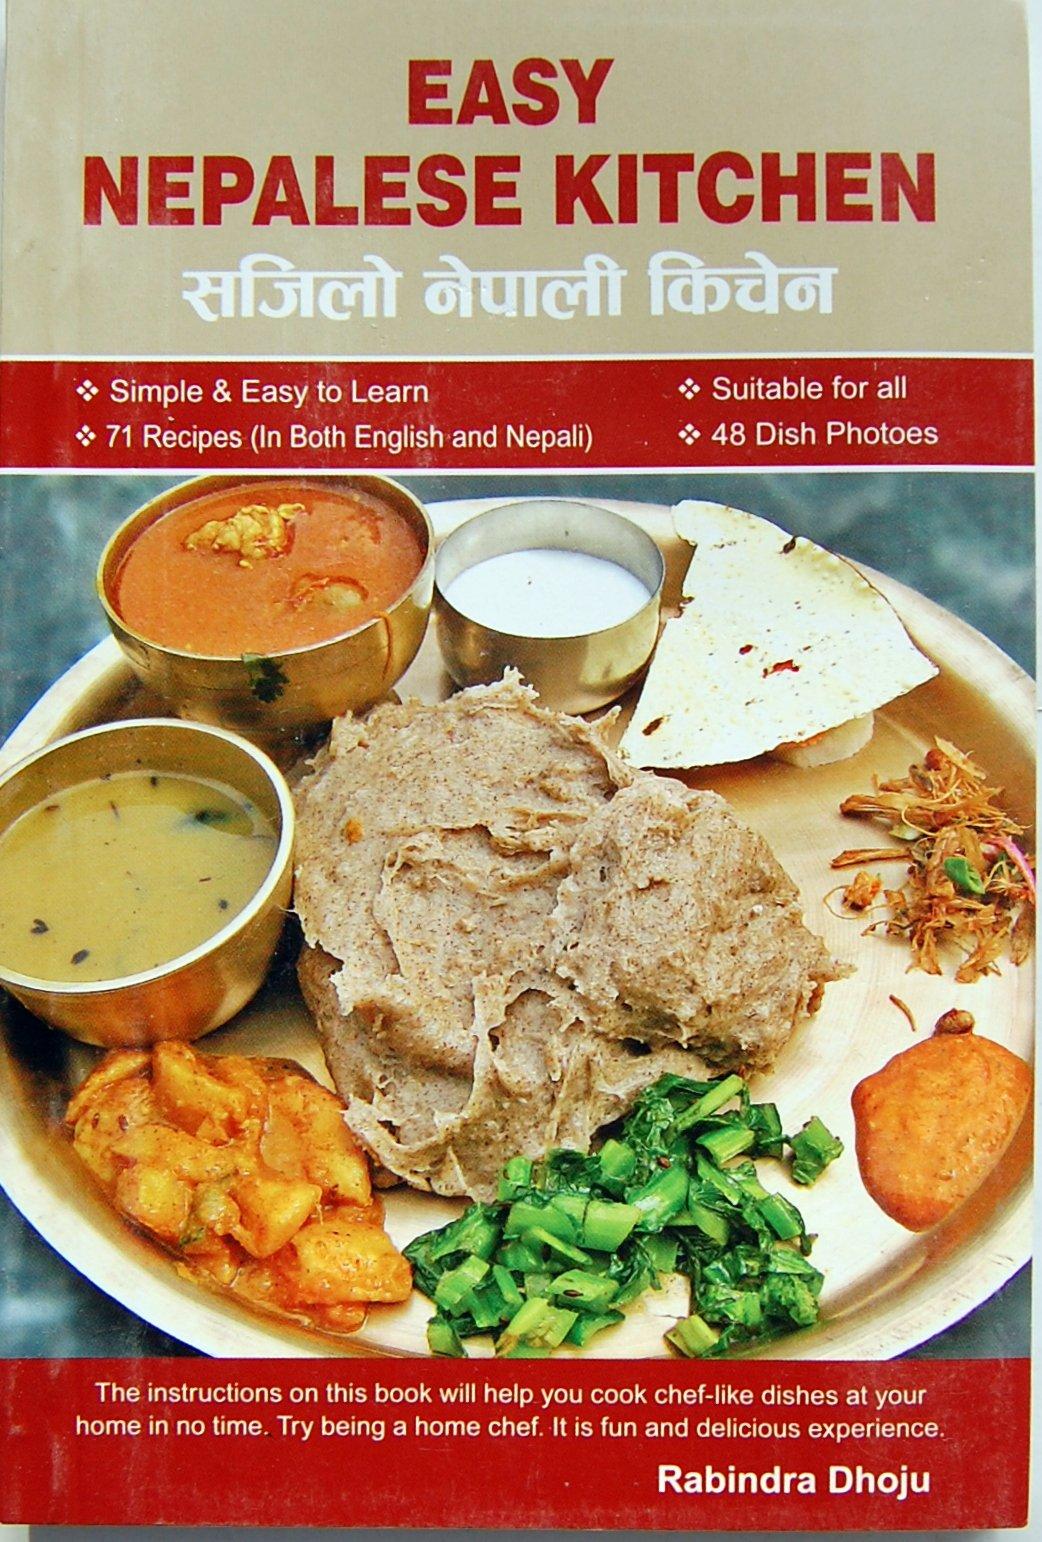 Easy nepalese kitchen rabindra dhoju 9789937863537 amazon books forumfinder Choice Image